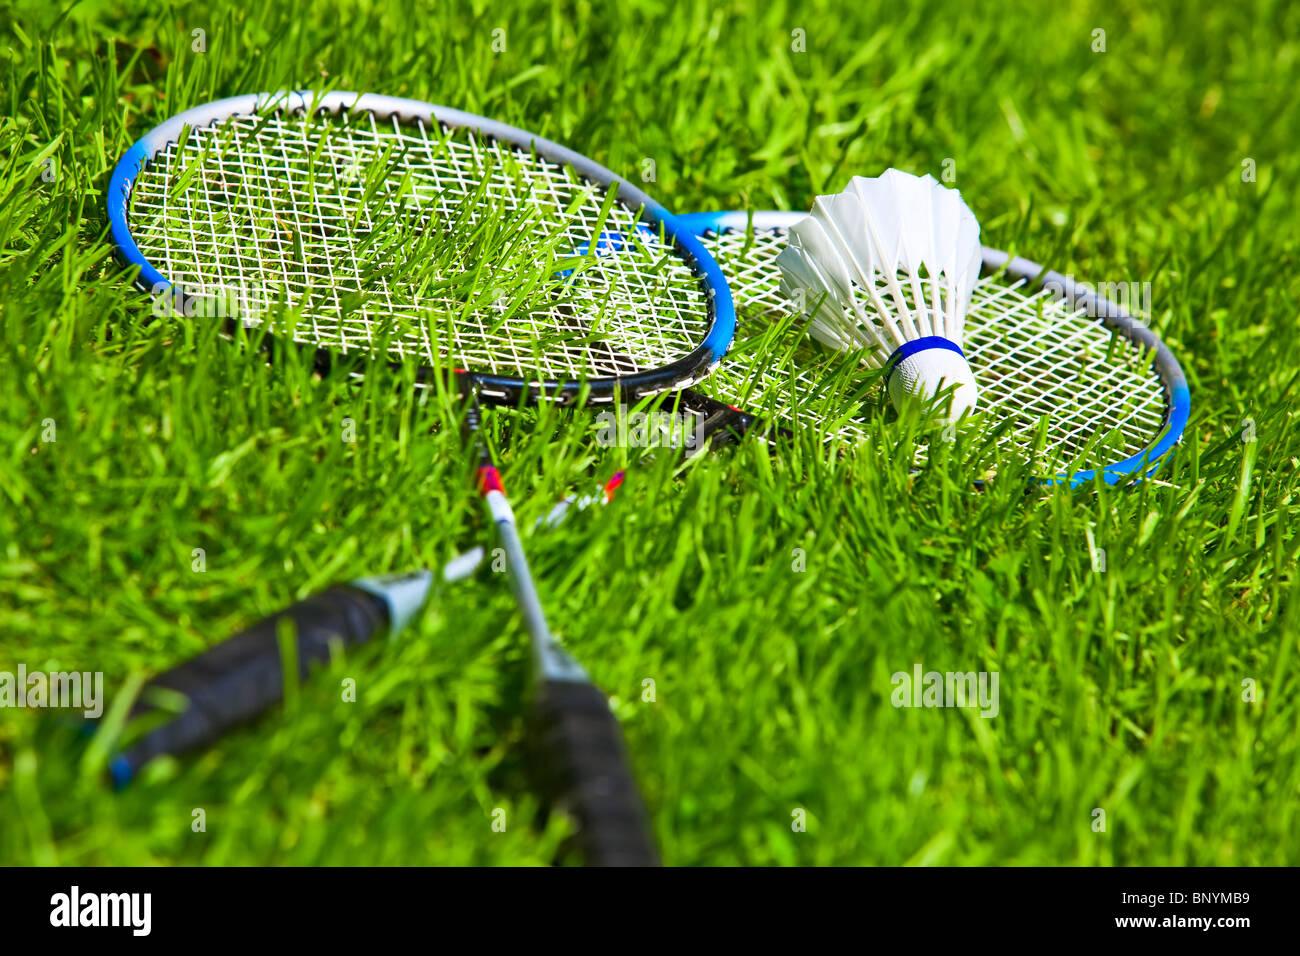 Badminton rackets on green grass. - Stock Image